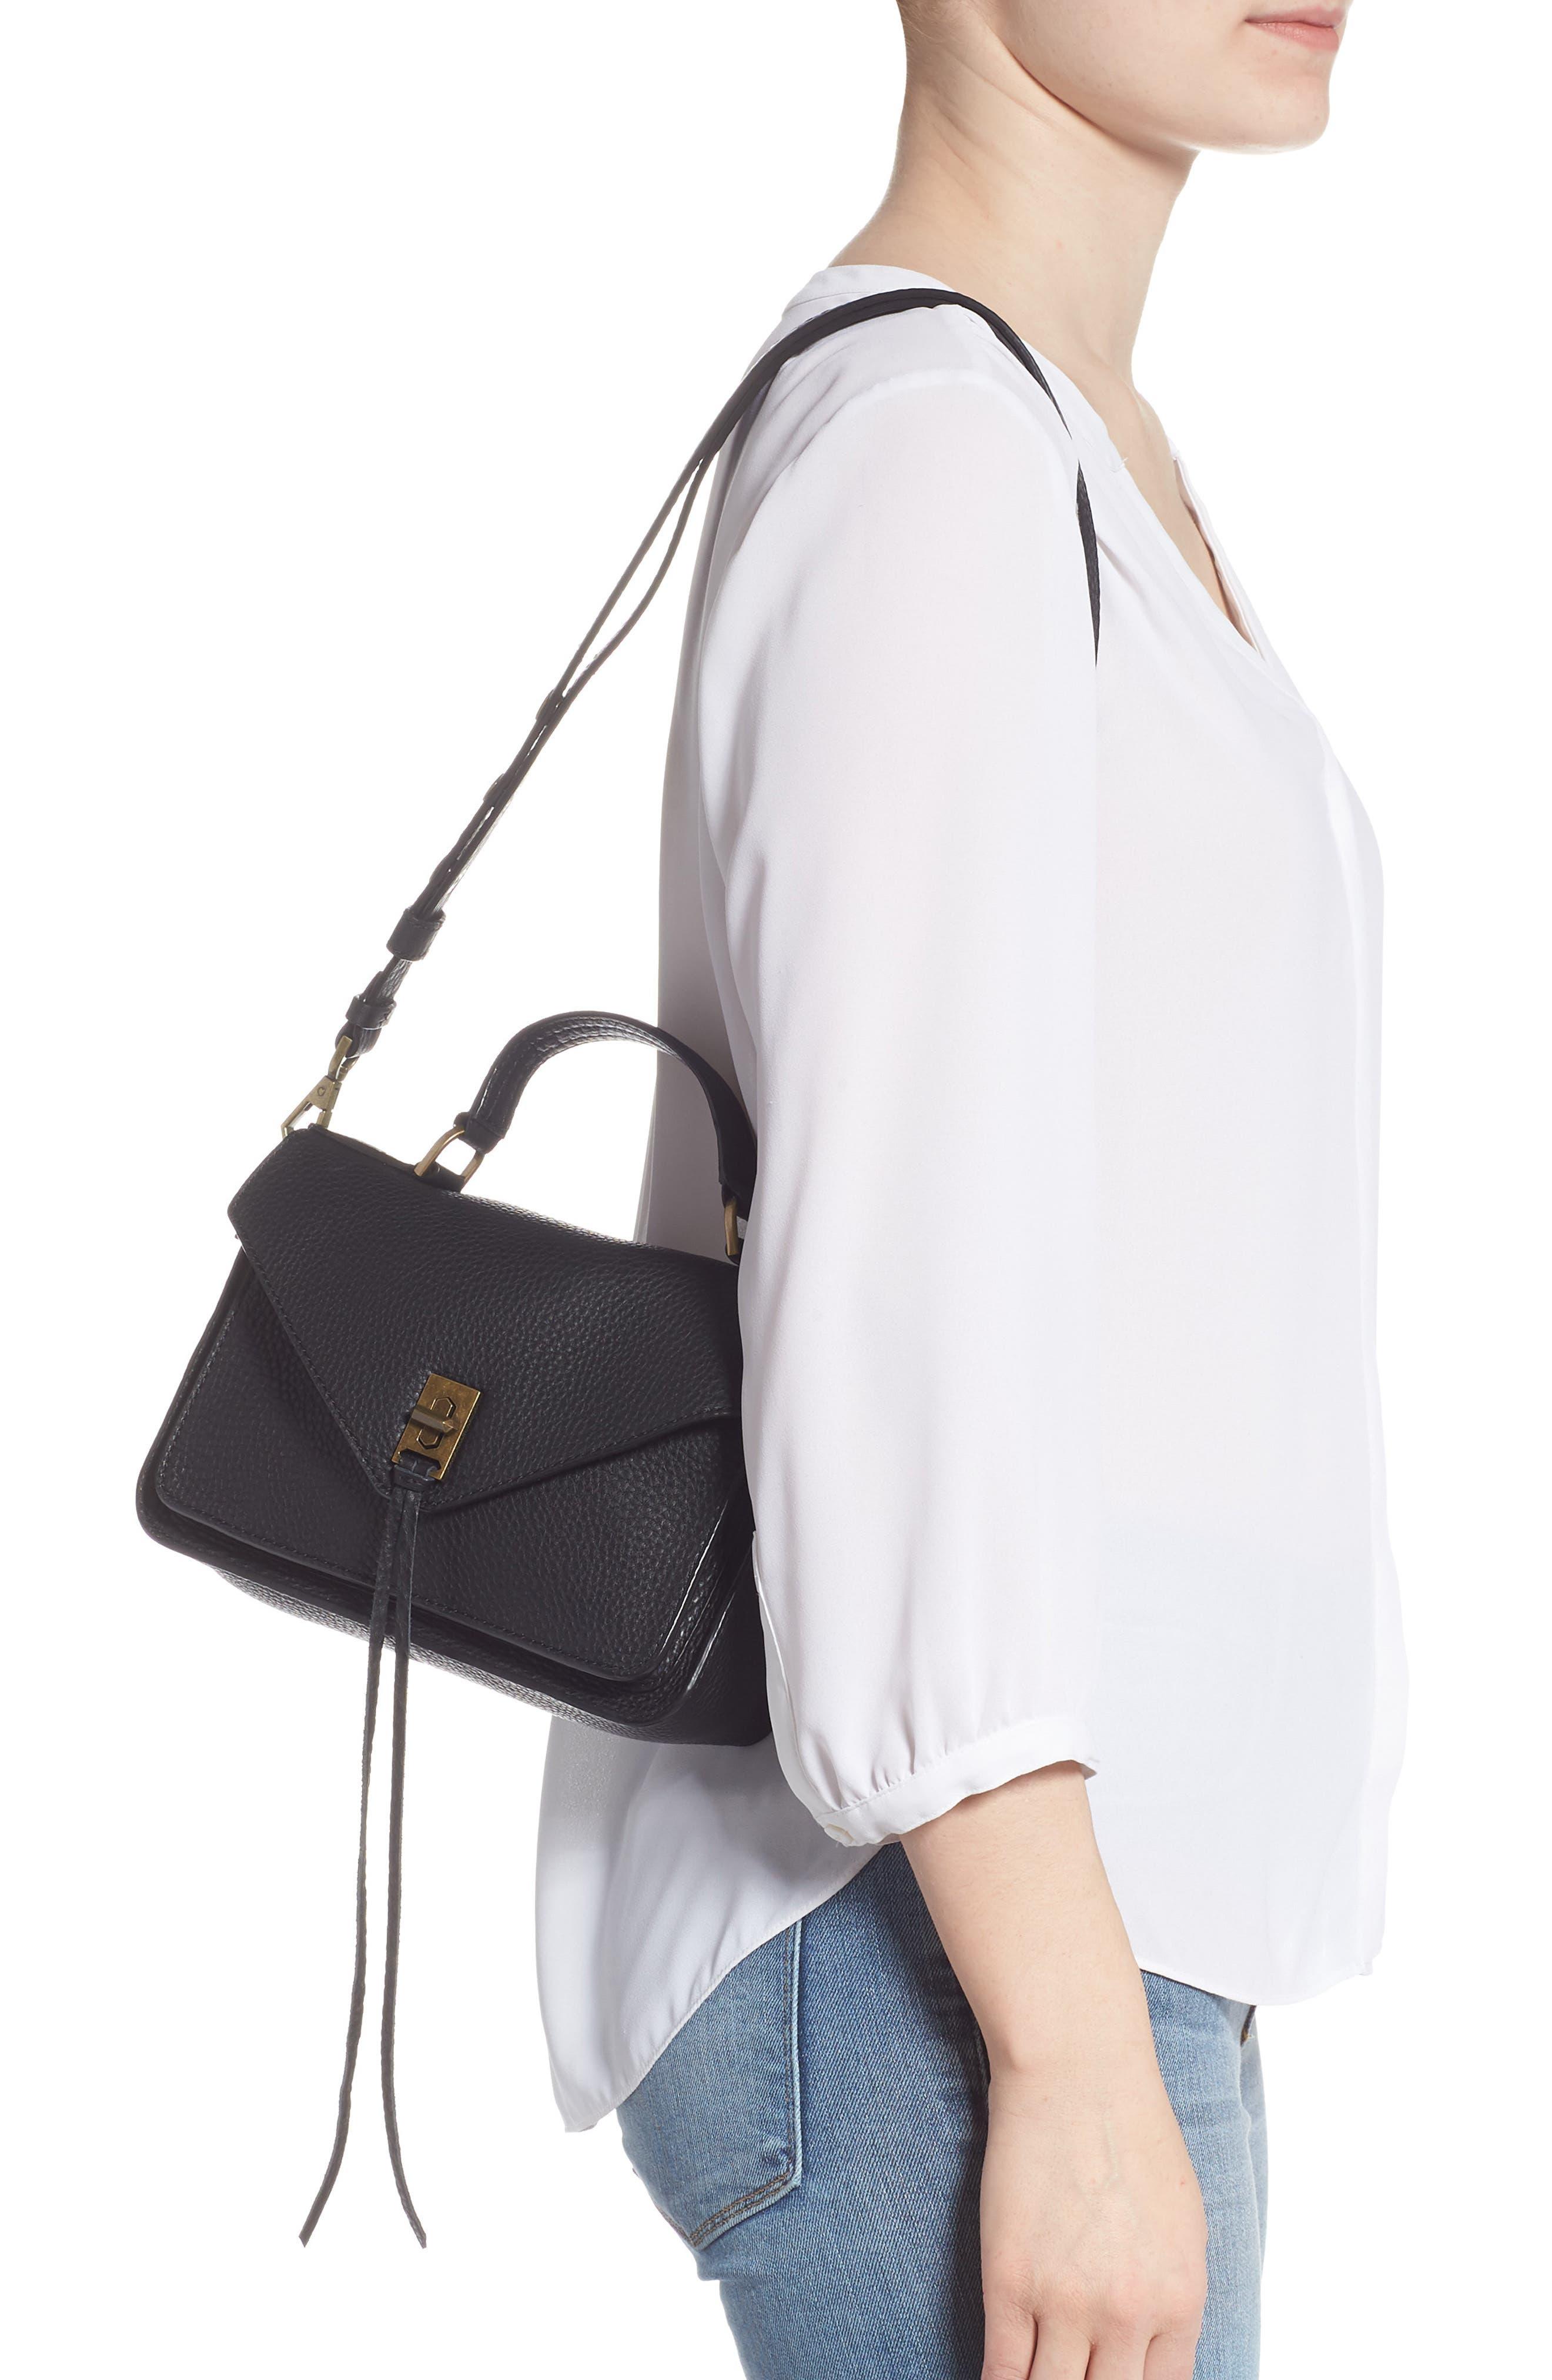 REBECCA MINKOFF, 'Small Darren' Leather Messenger Bag, Alternate thumbnail 2, color, BLACK